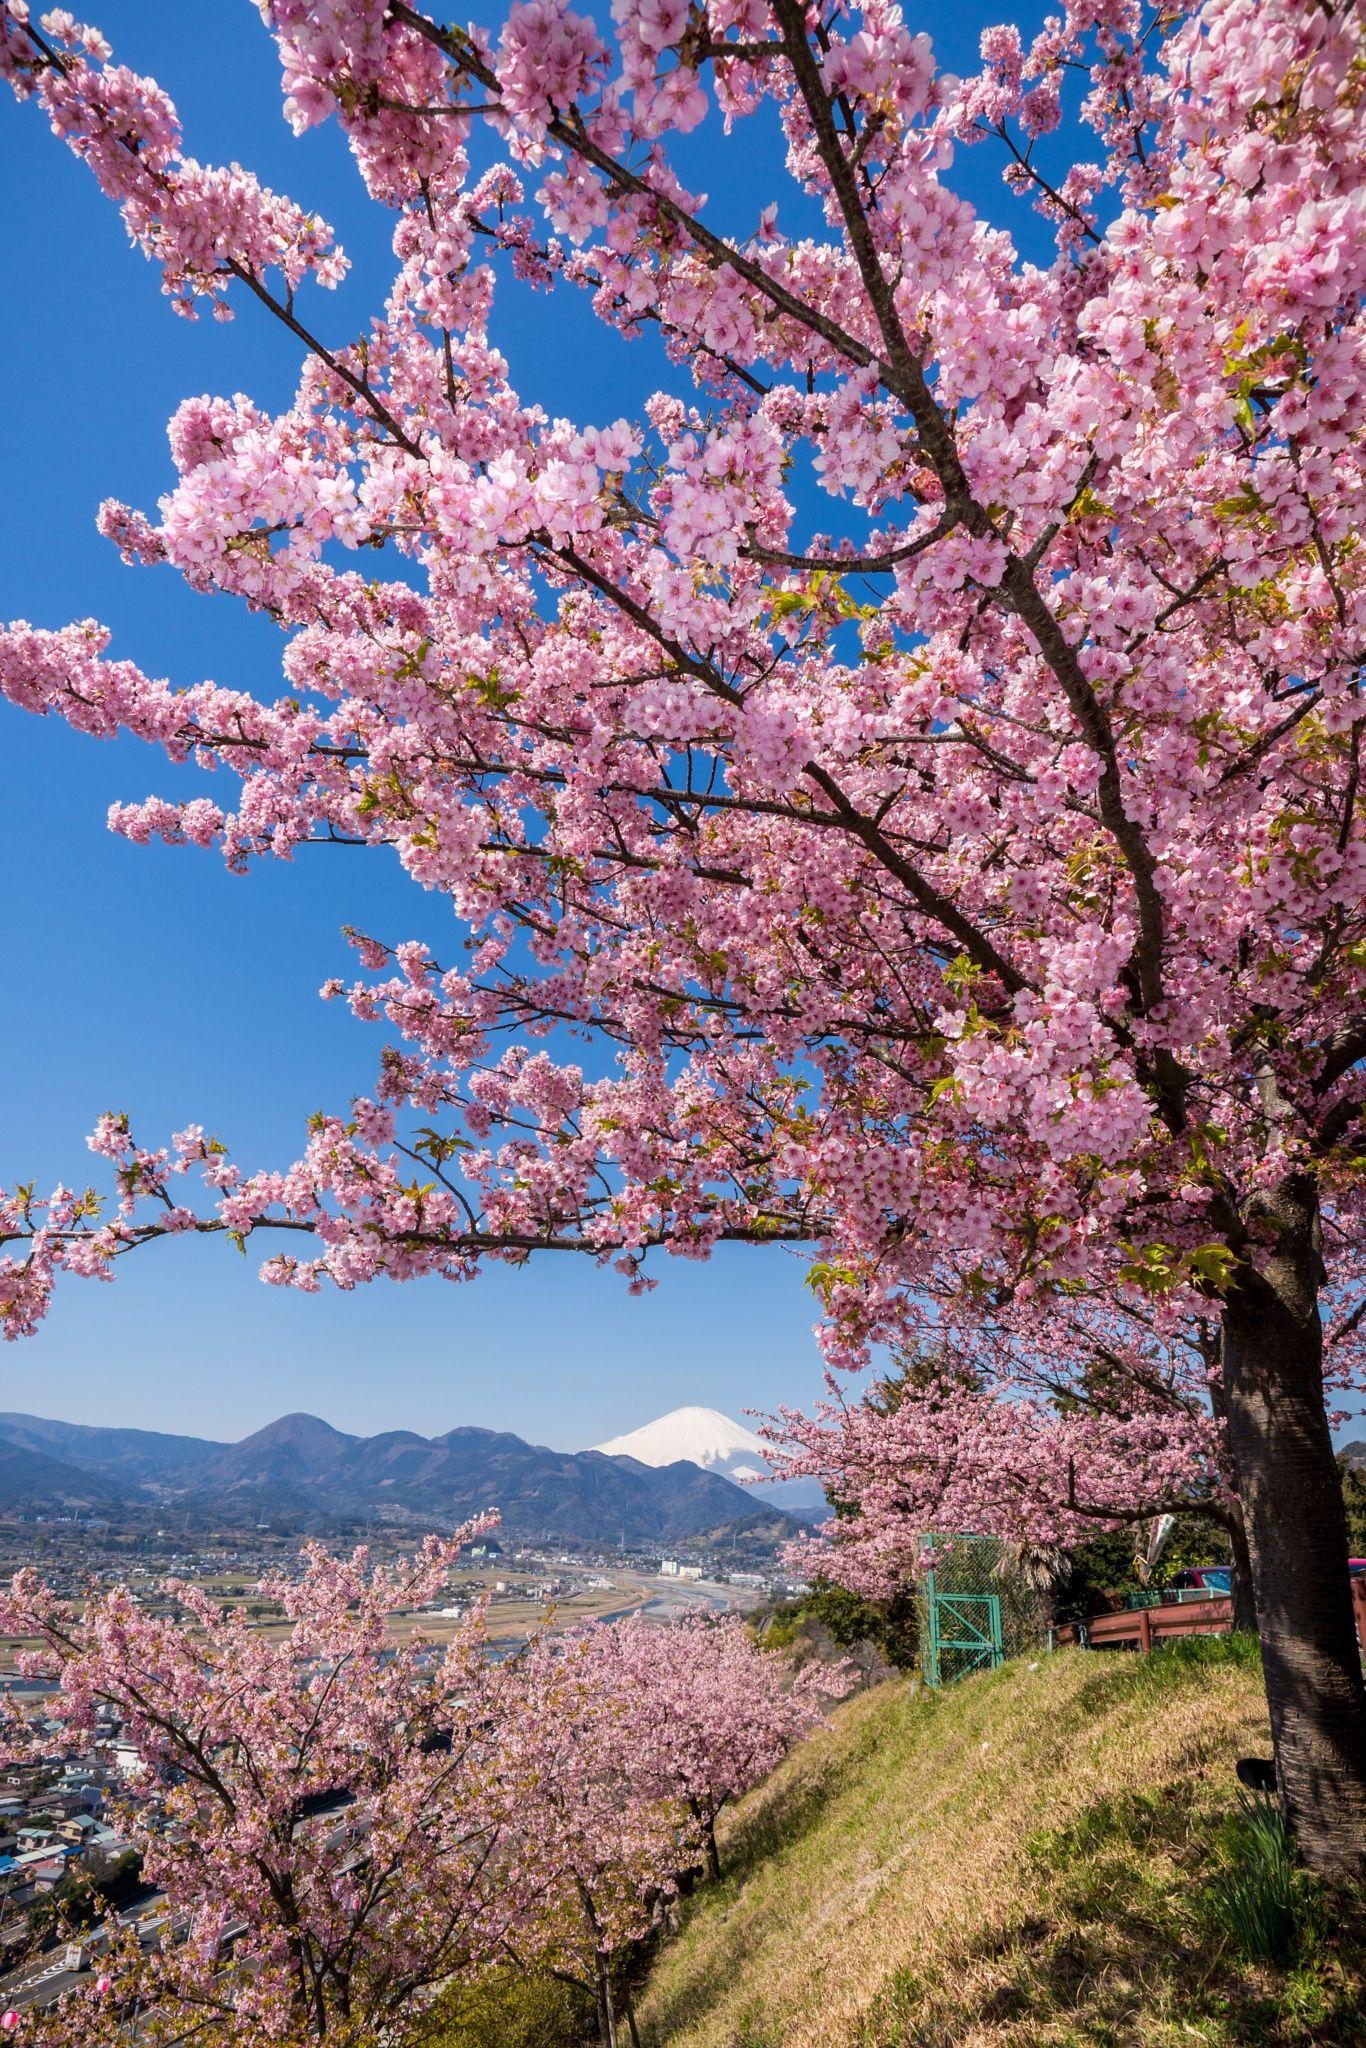 Mt Fuji And Cherry Blossom Blossom Trees Beautiful Nature Cherry Blossom